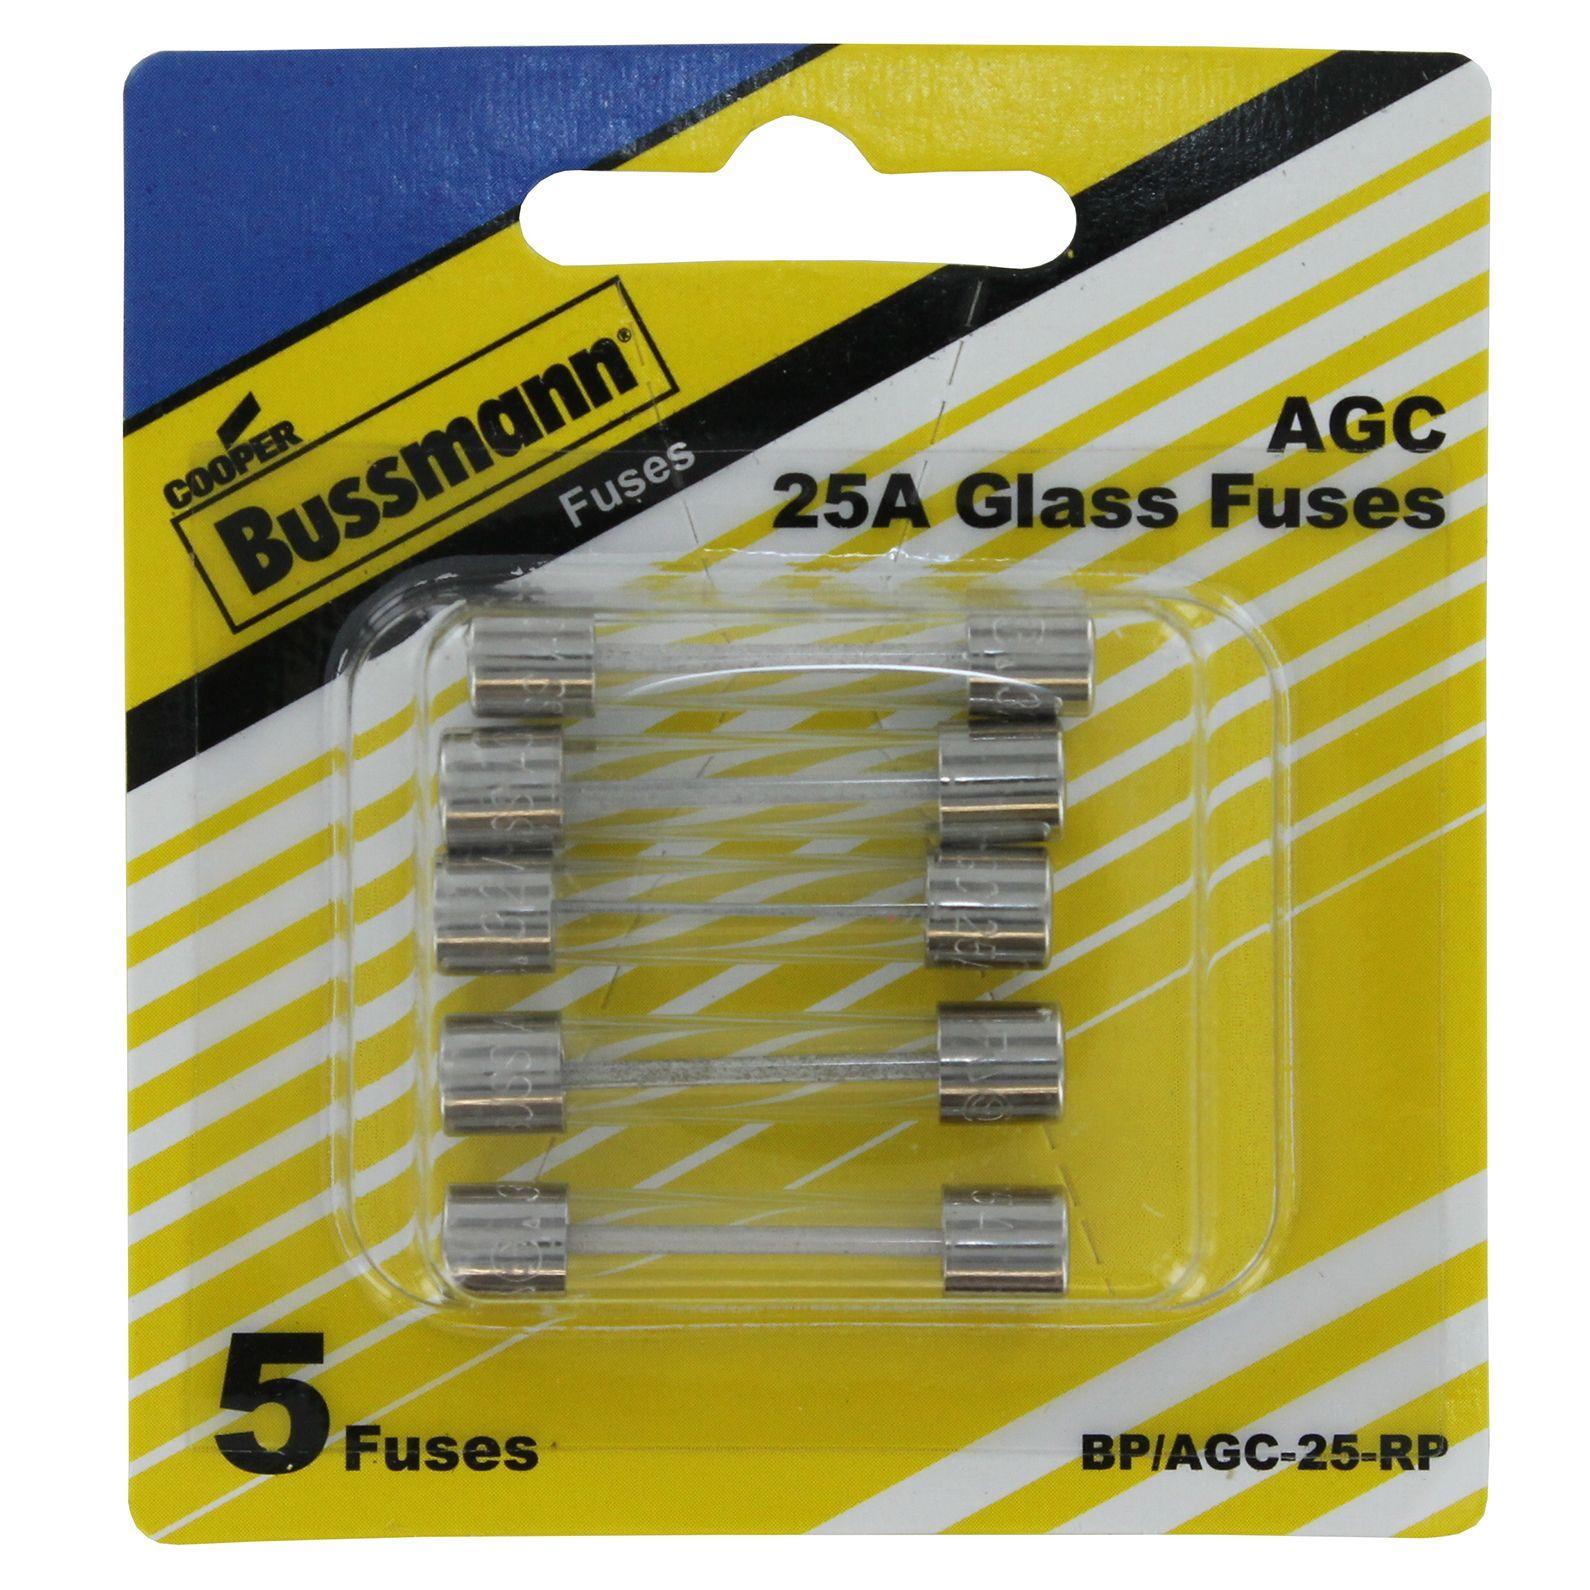 Bussmann BP//AGC-20 20 Amp Fast Acting Glass Tube Fuse